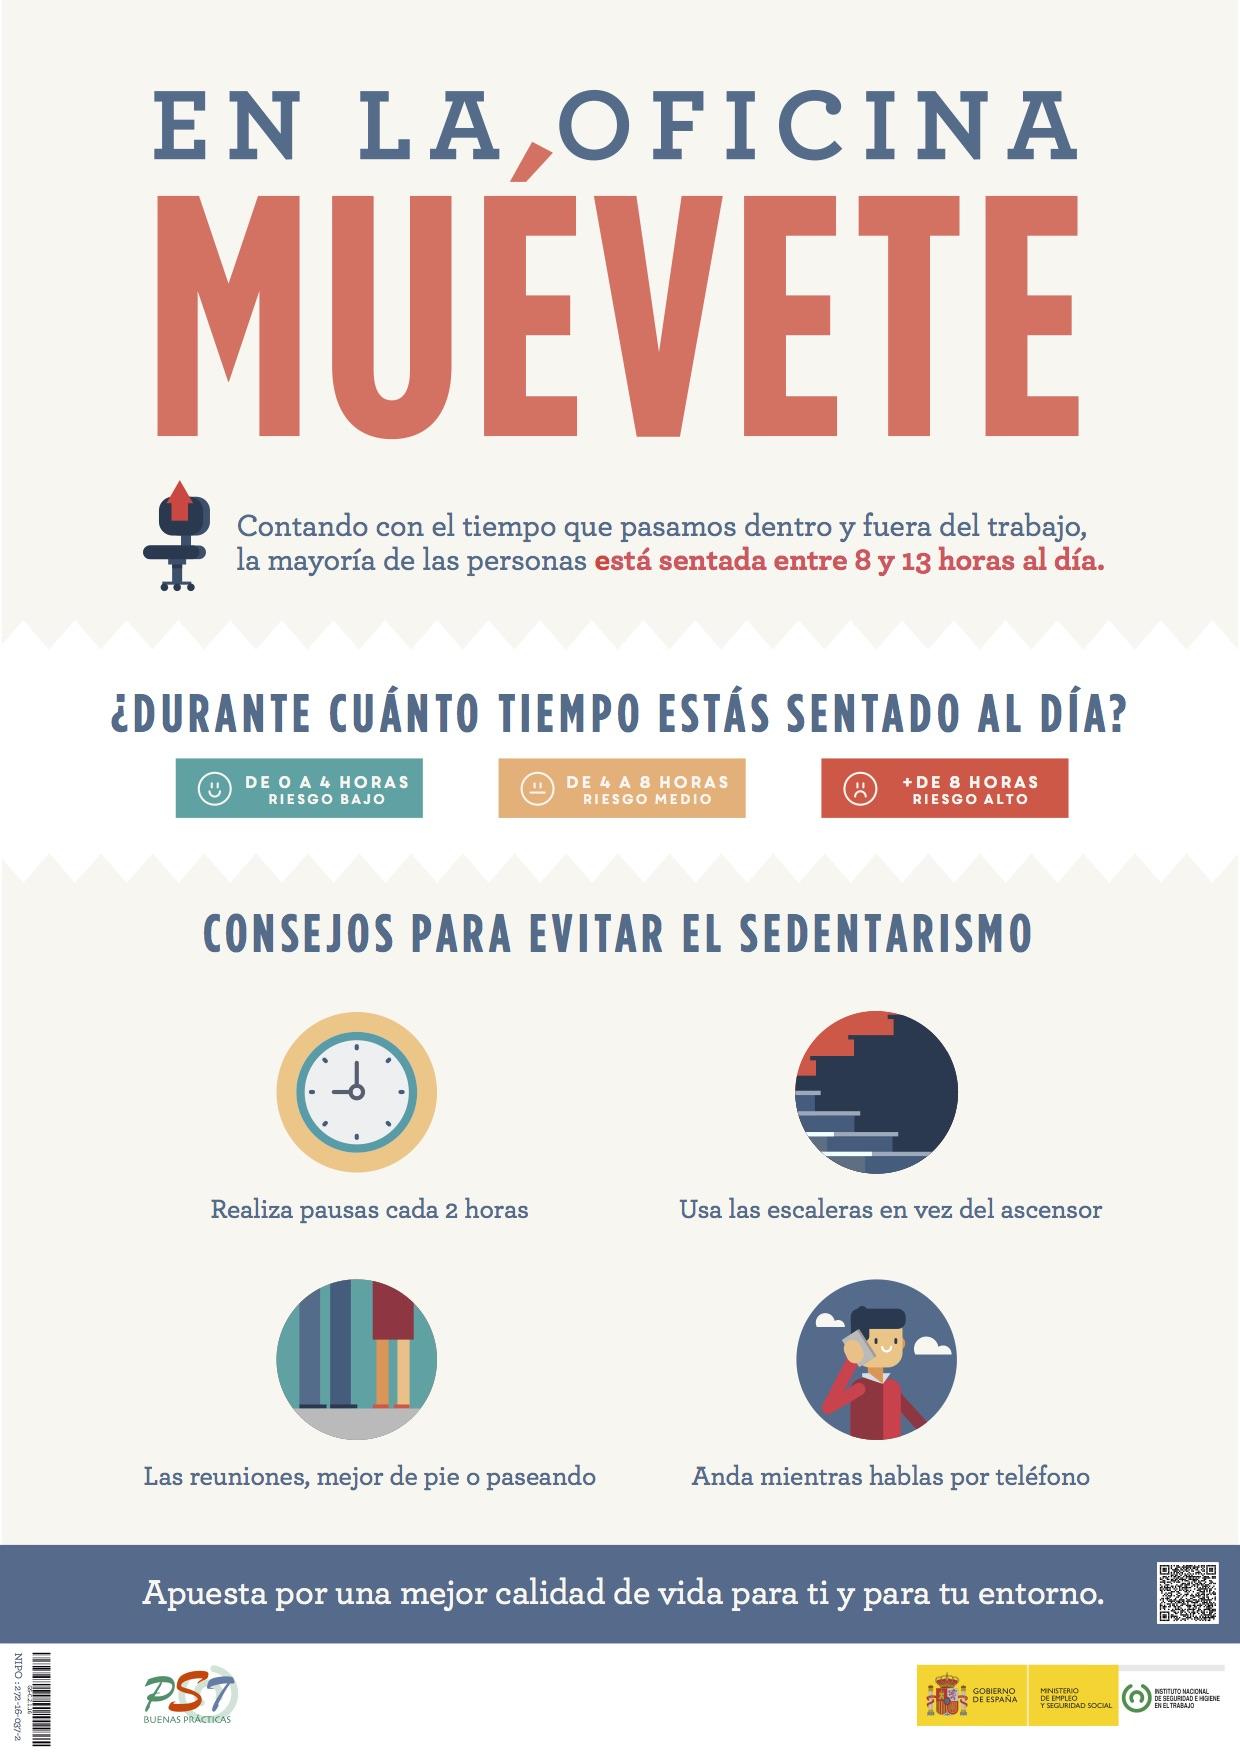 En La Oficina Mu Vete Infografia Infographic Rrhh